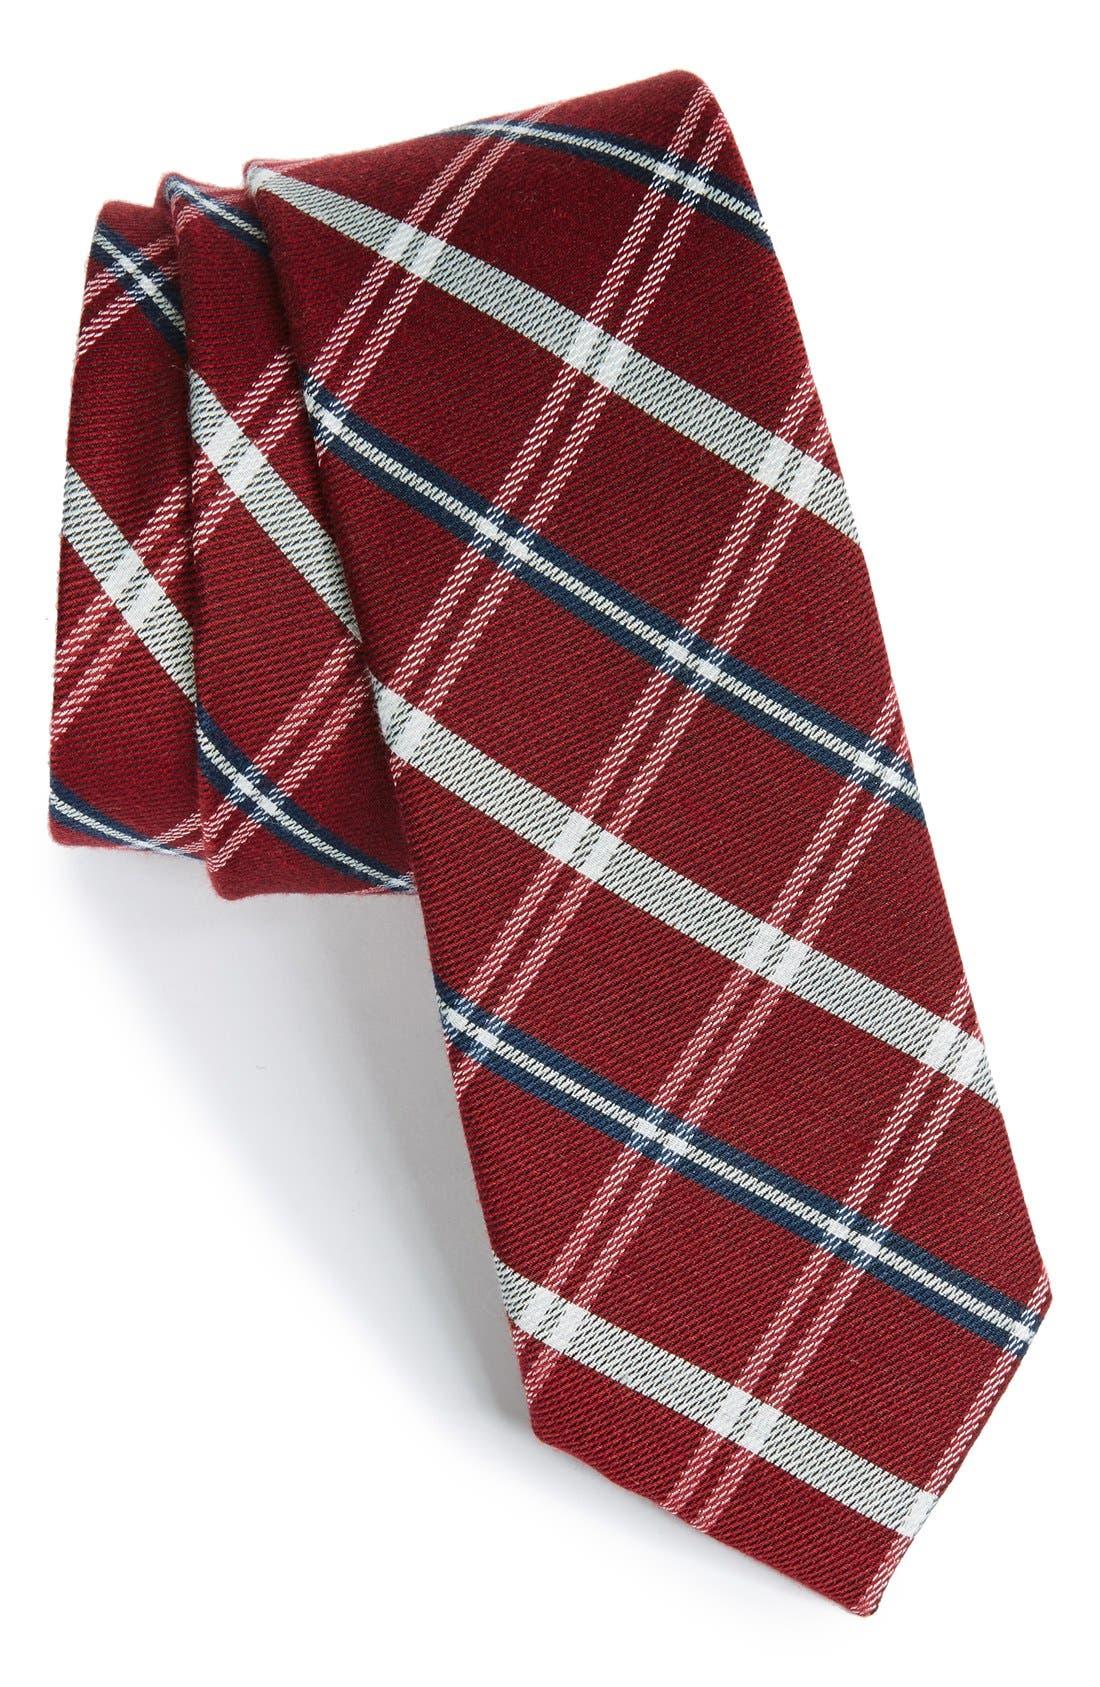 Main Image - 1901 'Logan' Plaid Tie